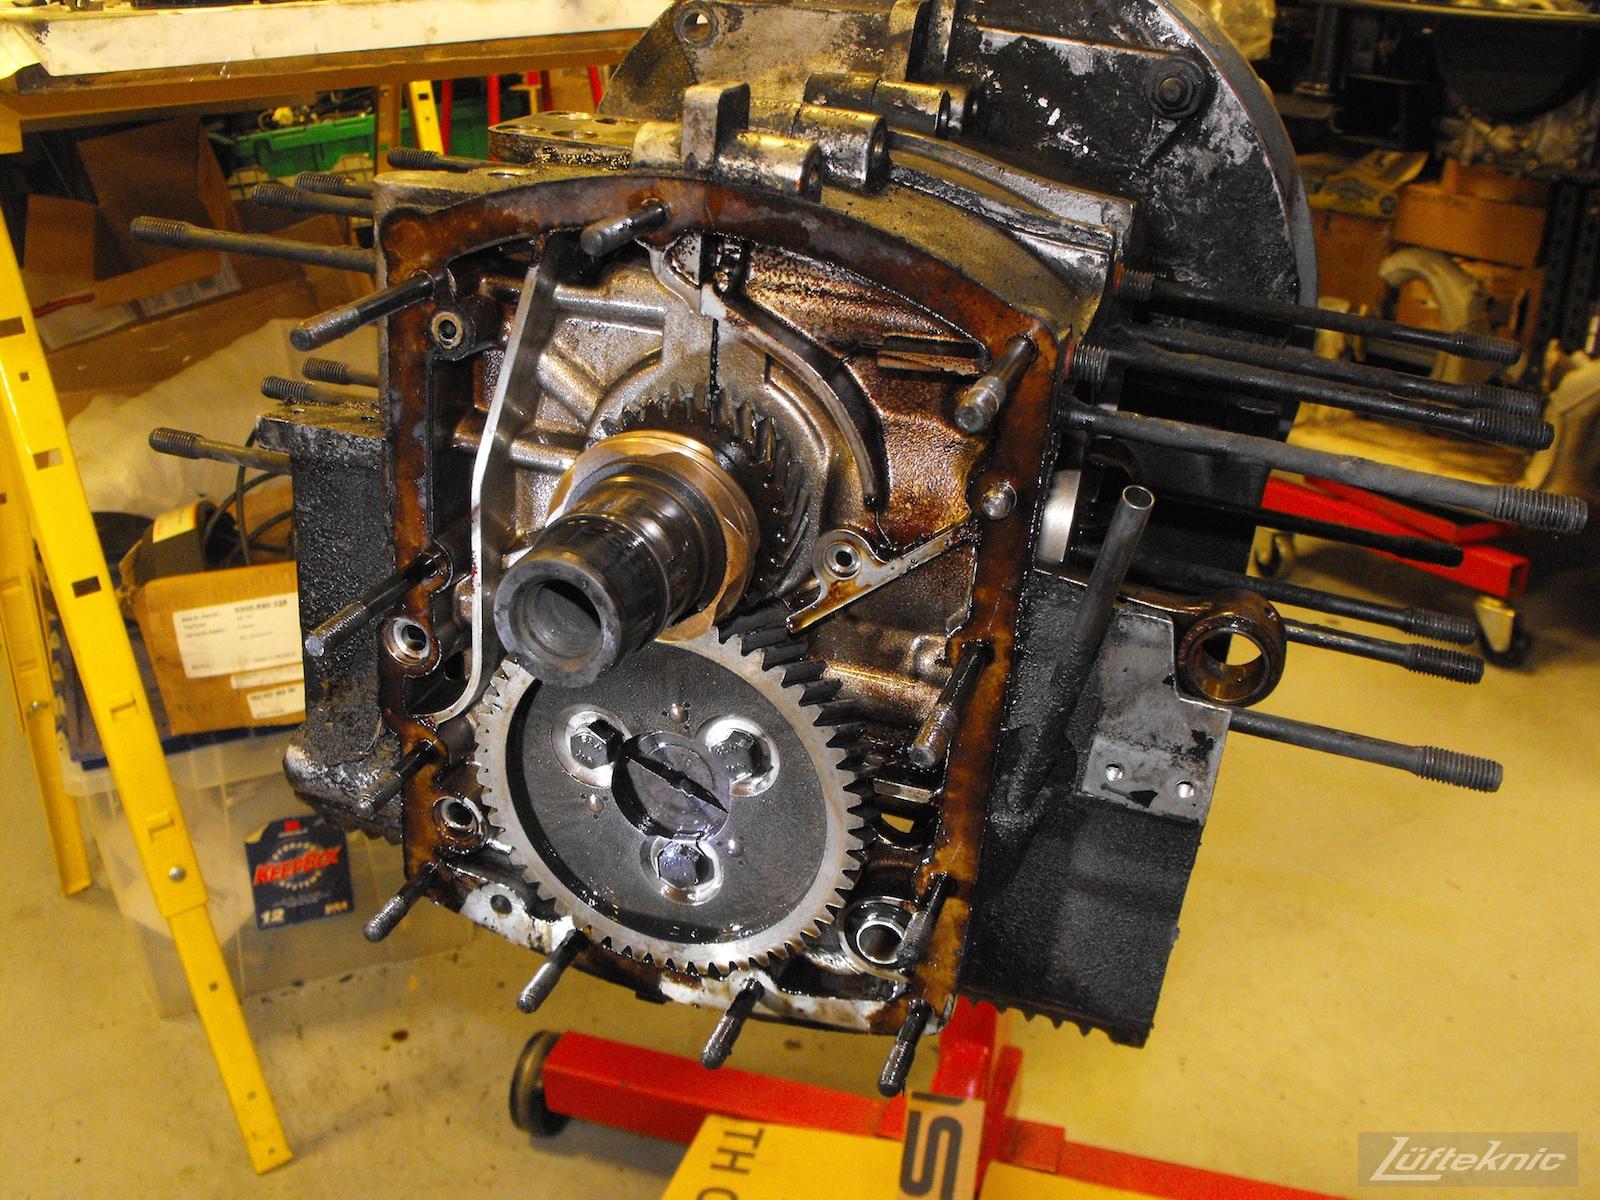 A torn down engine case from an Irish Green Porsche 912 undergoing restoration at Lufteknic.